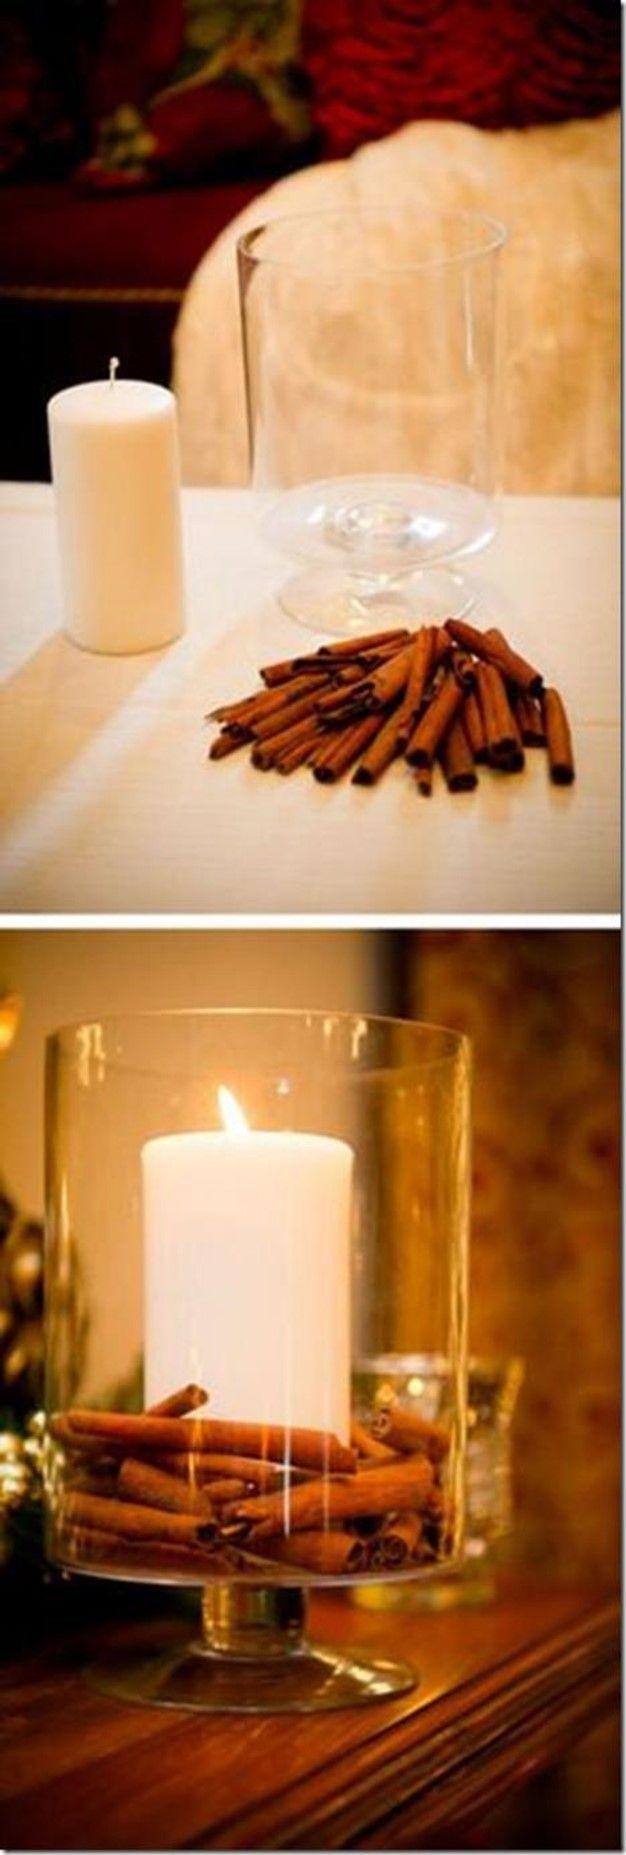 Best 25 Cheap Table Centerpieces Ideas On Pinterest Wedding Centerpieces Cheap Simple